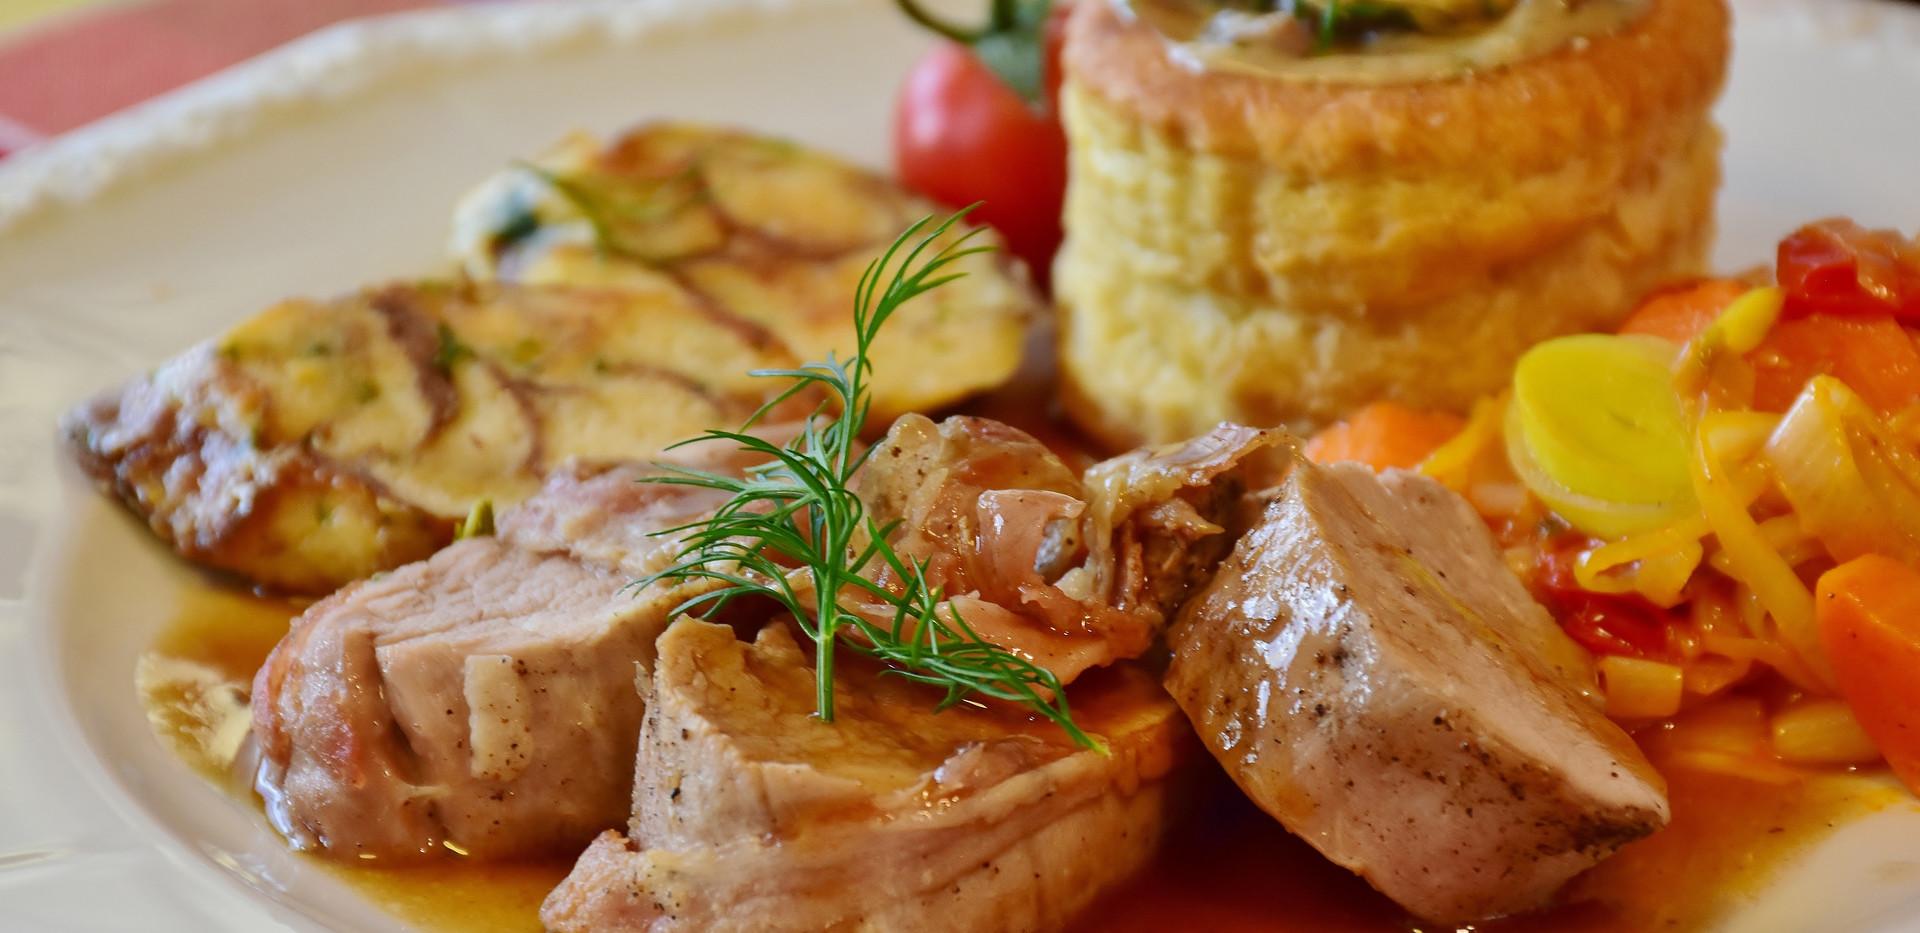 close-up-cook-cuisine-248422.jpg